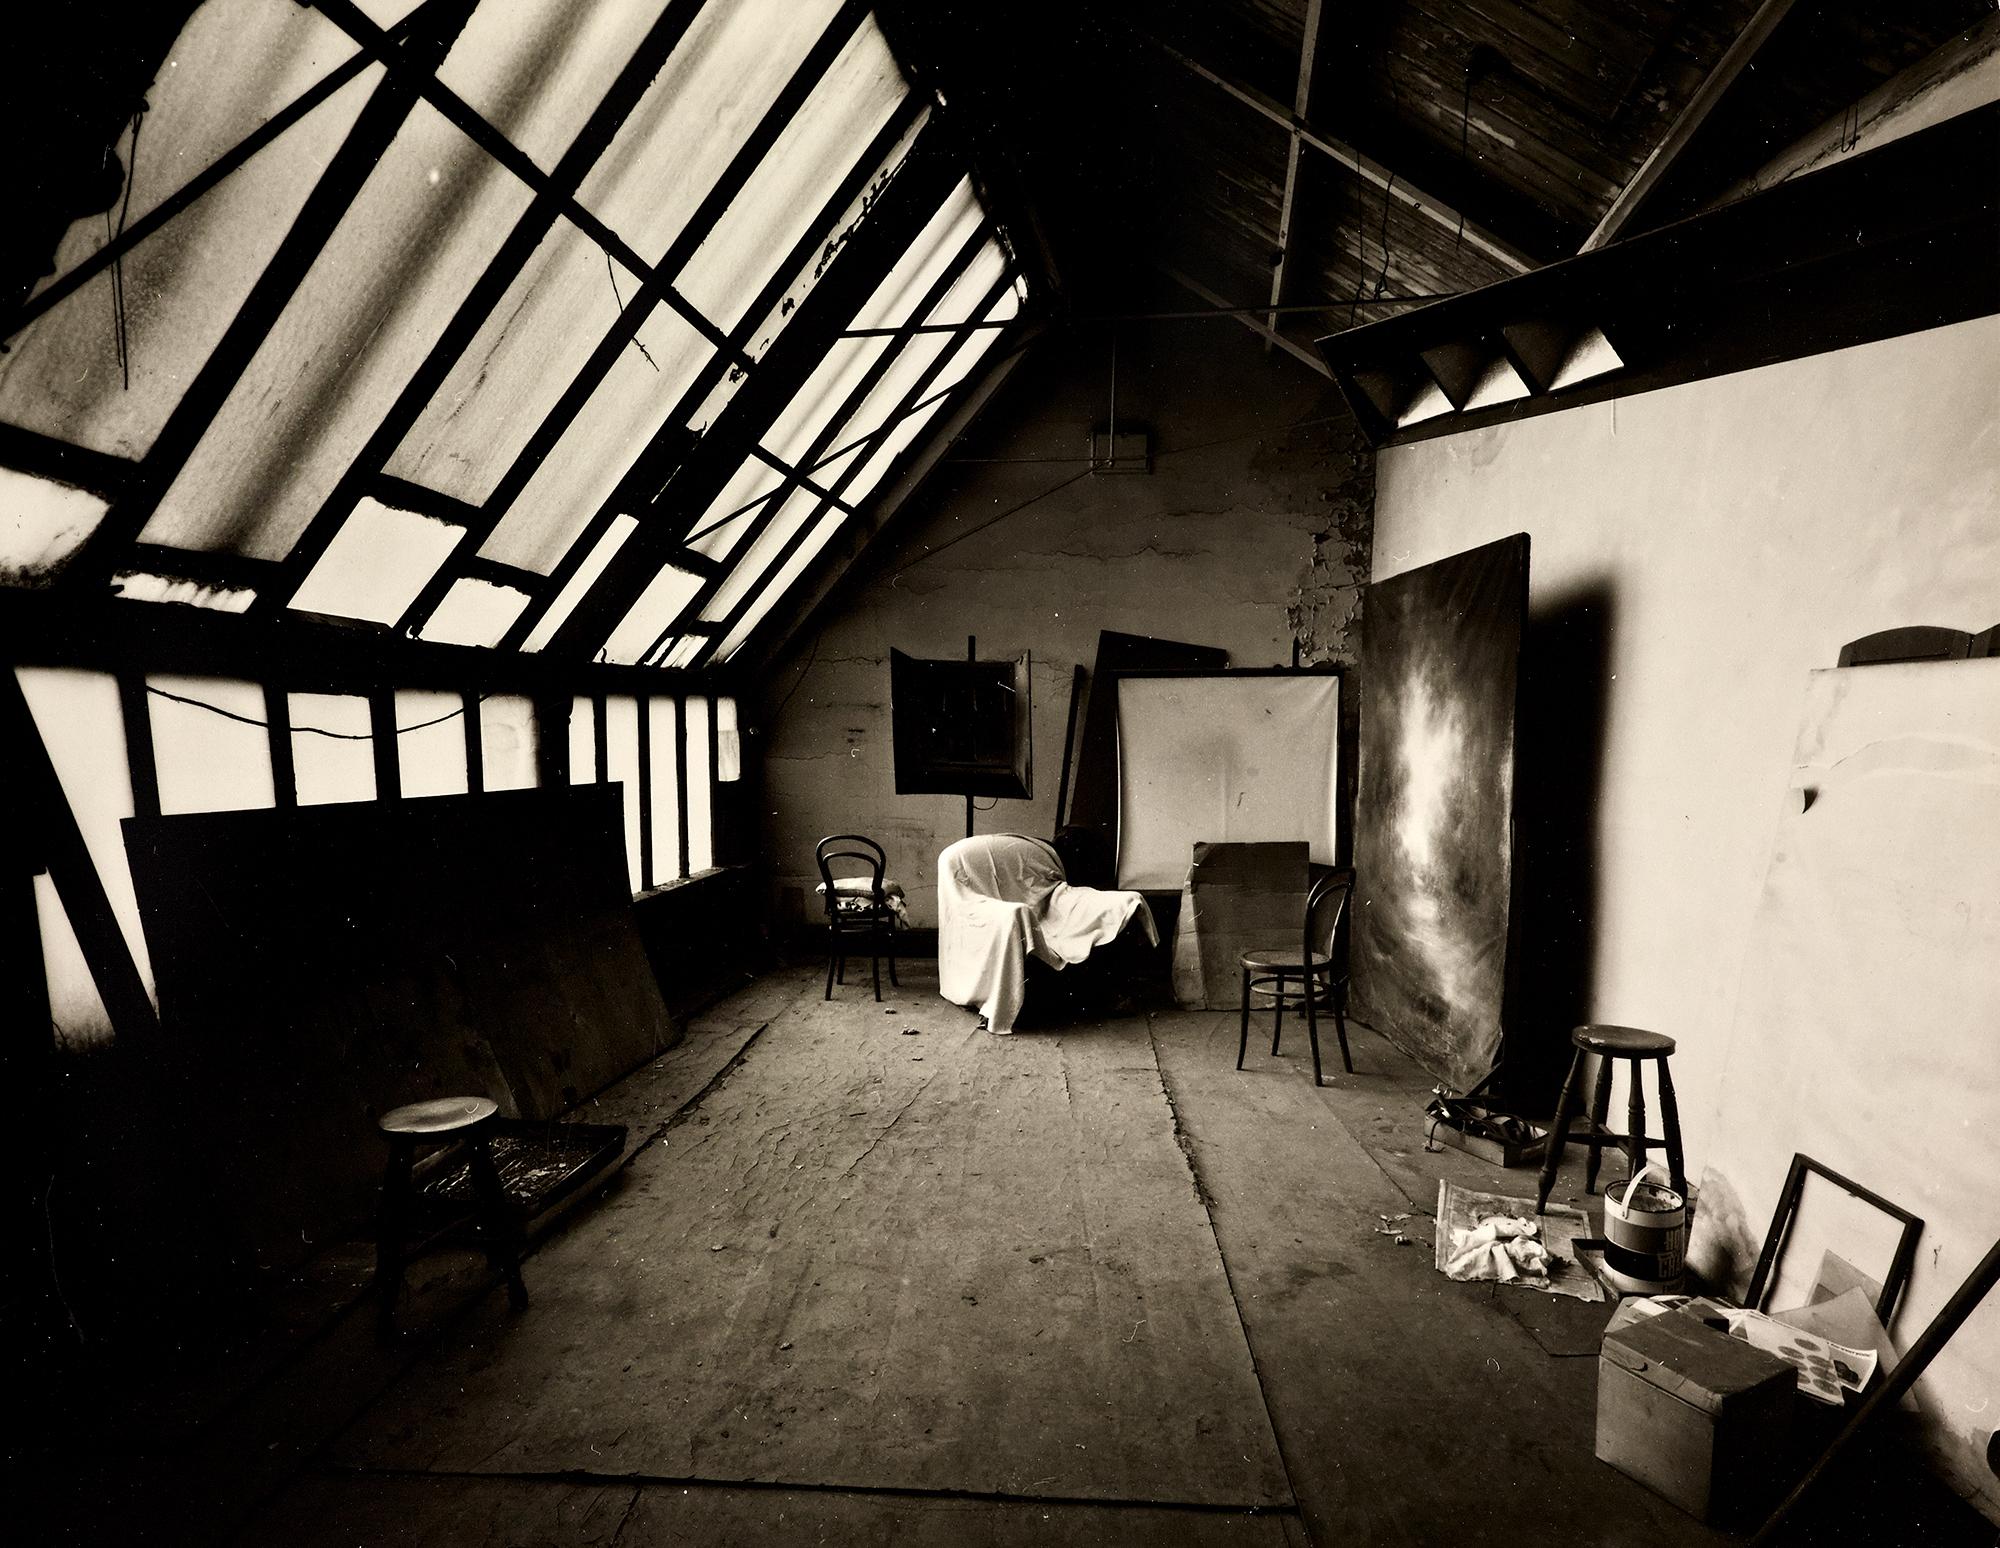 The inside of Belle Vue Studios